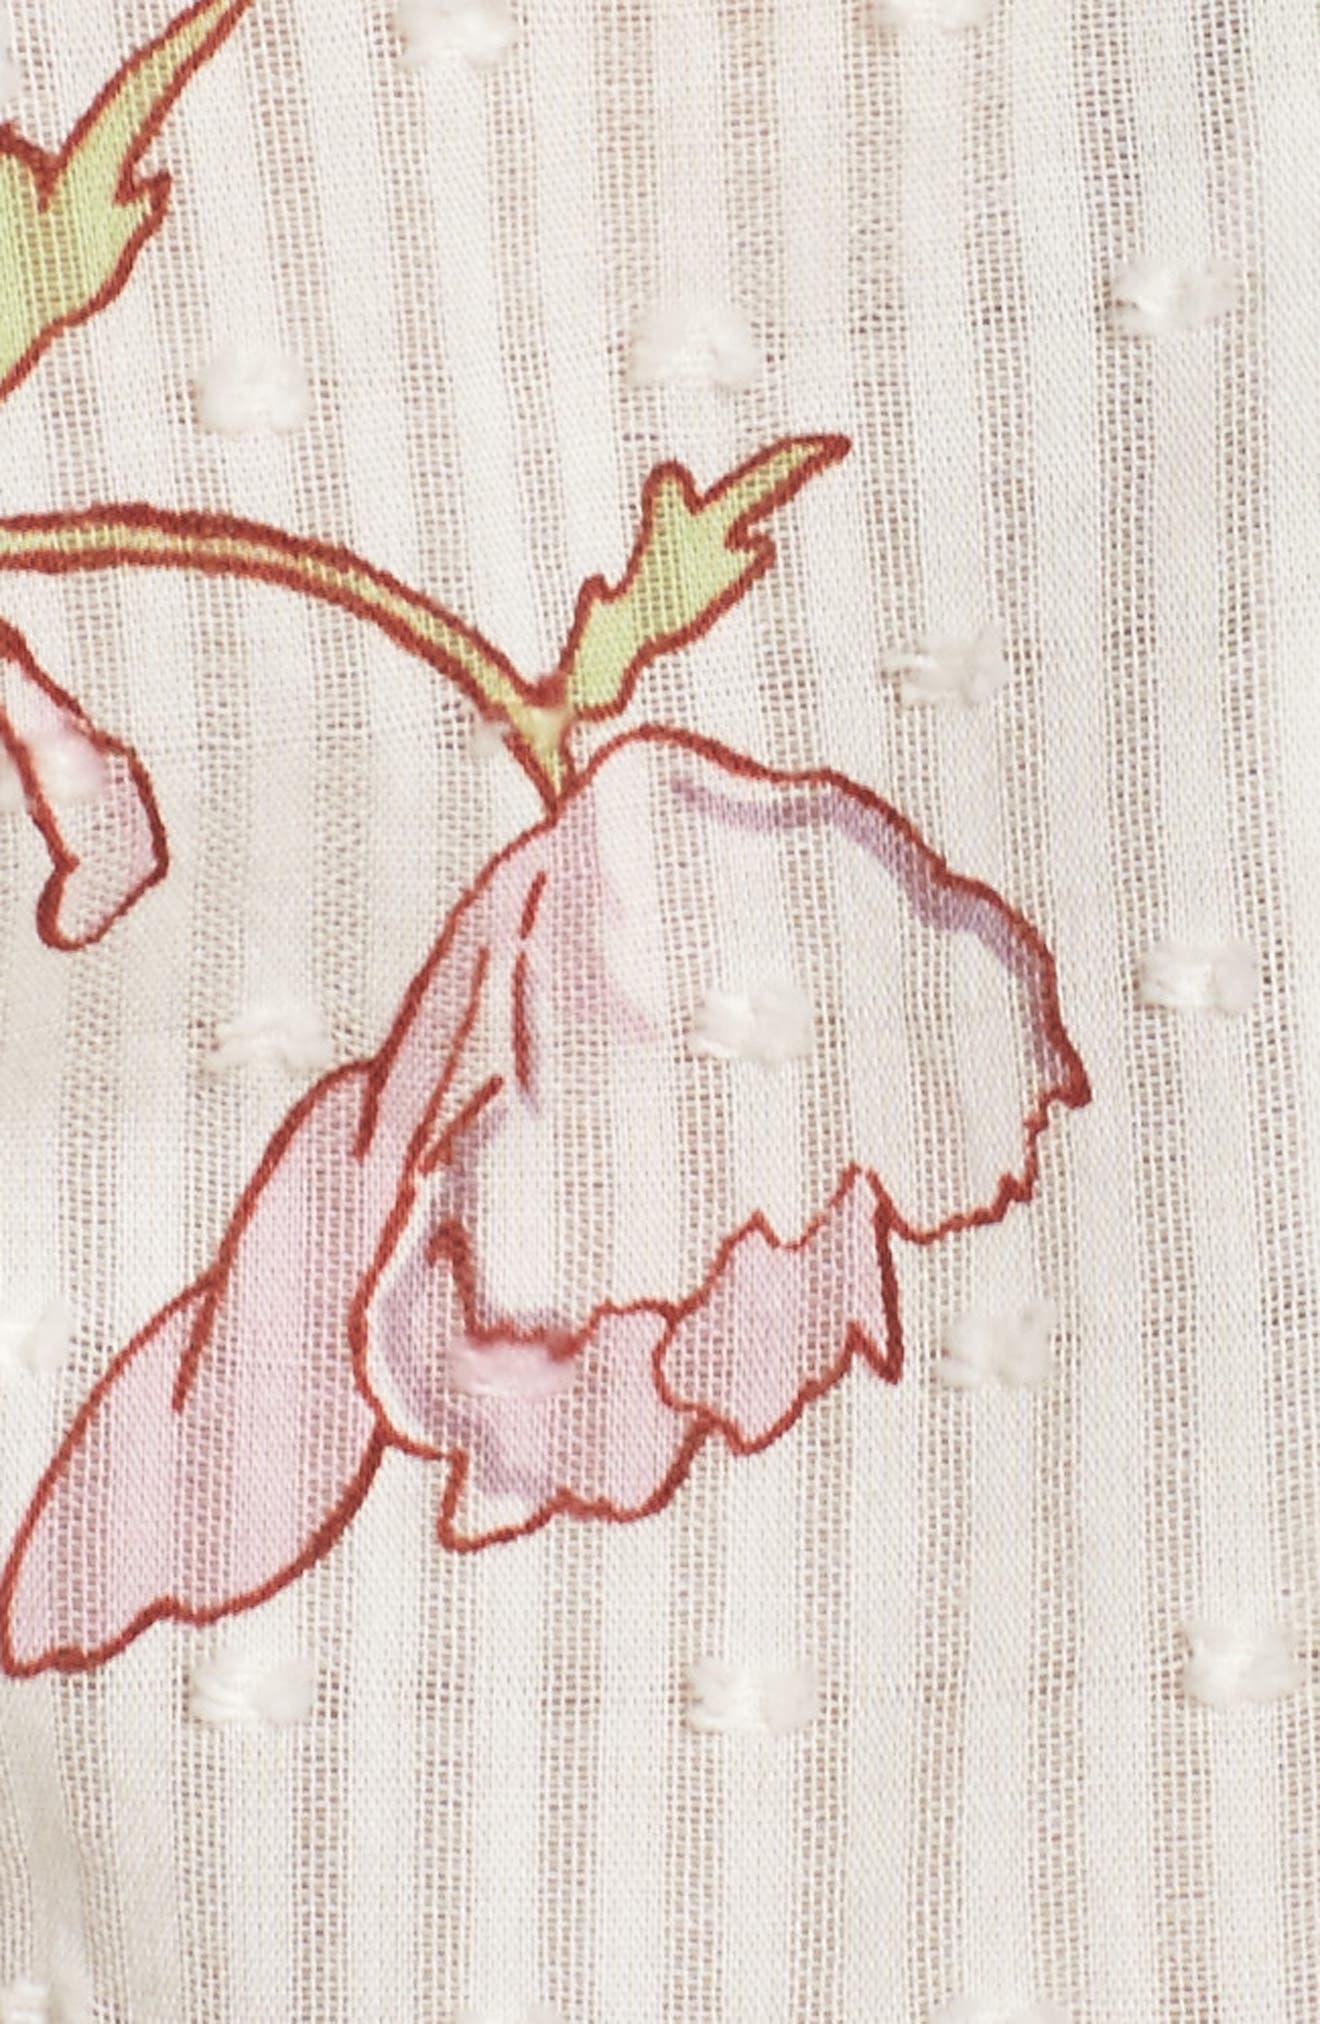 Yardley Floral Minidress,                             Alternate thumbnail 6, color,                             WHITE / MAUVE SHADOWS